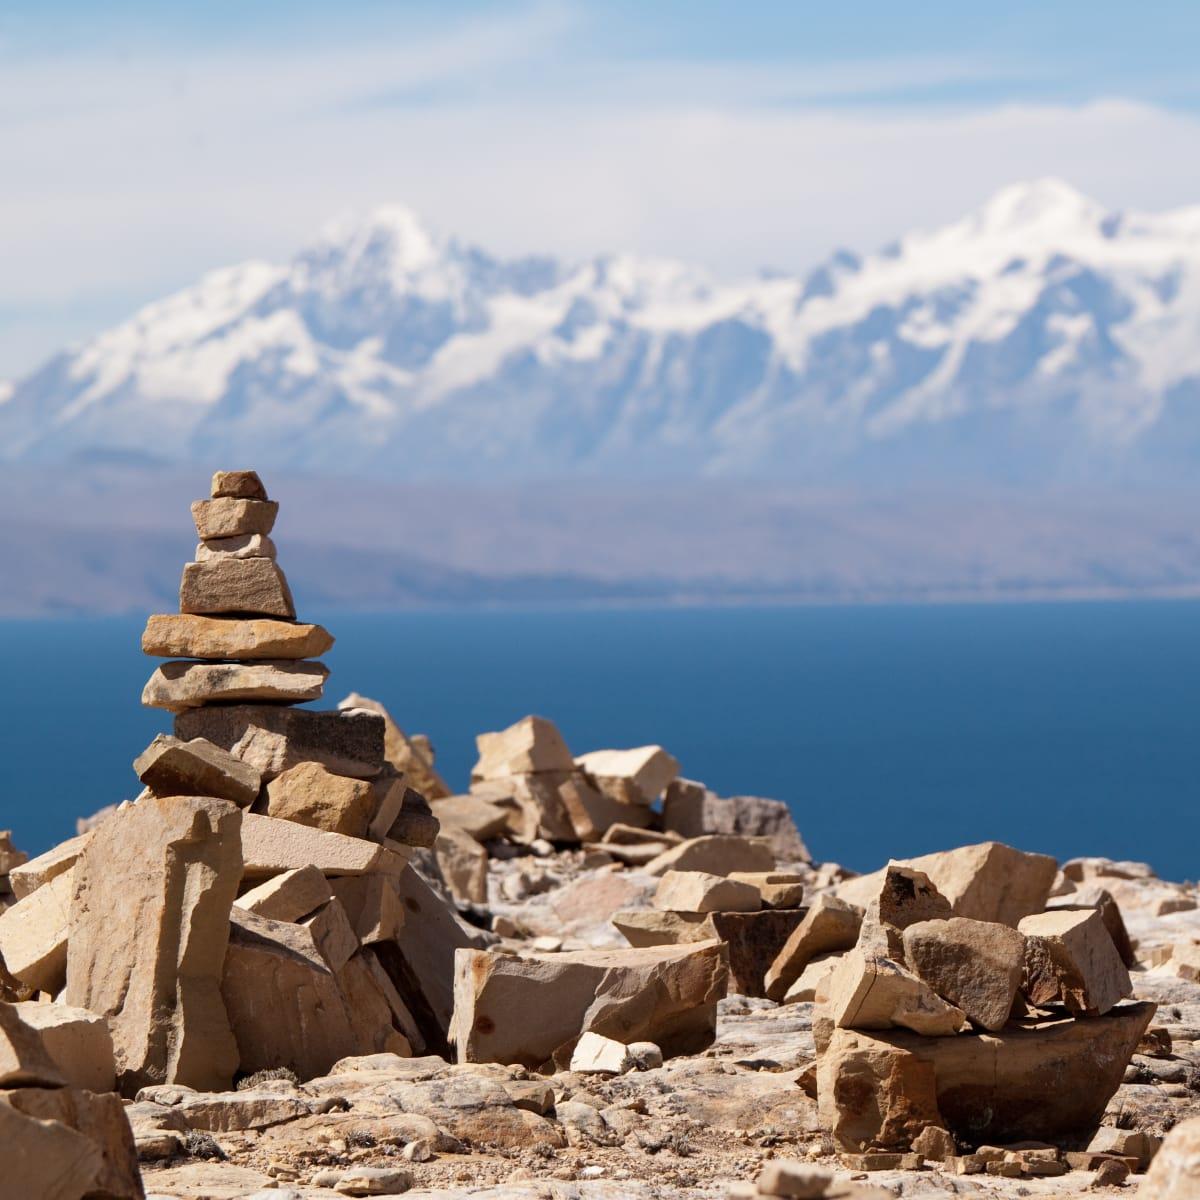 Rock pyramid, Lake Titicaca and Bolivian mountains